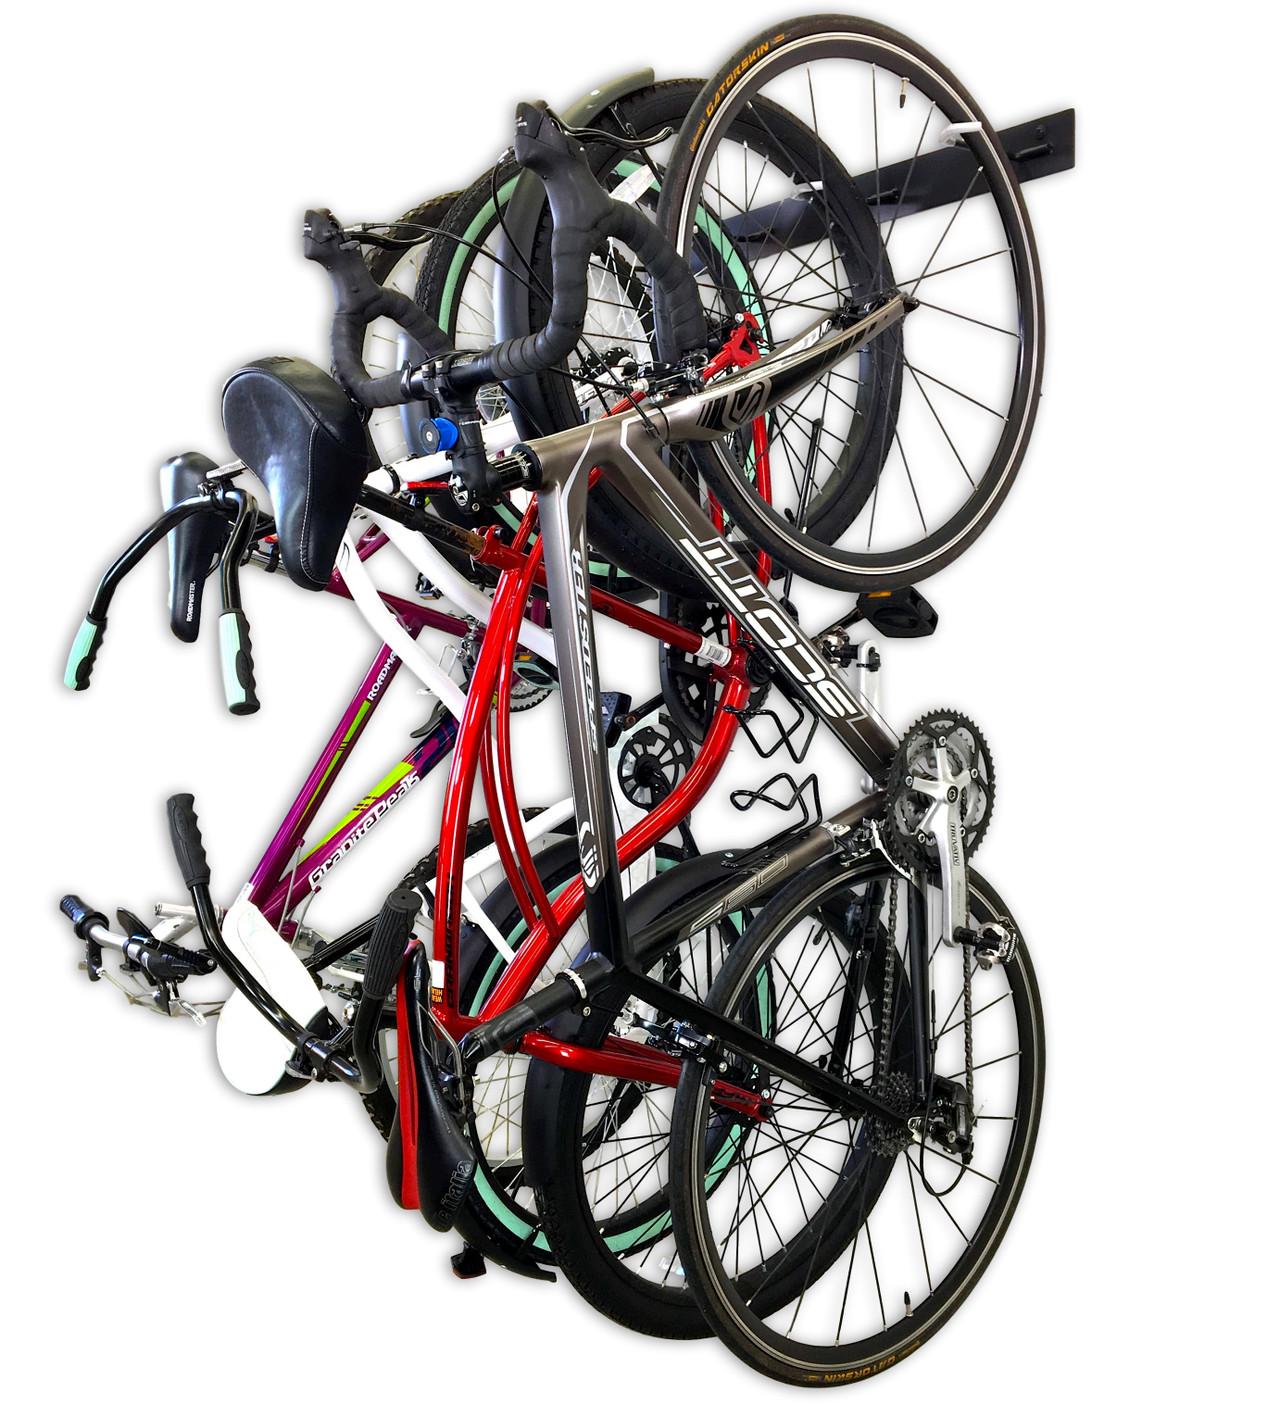 Tire Skates Holder Storage Mount Heavy Duty Wheels Durable Rust Resistant Sturdy